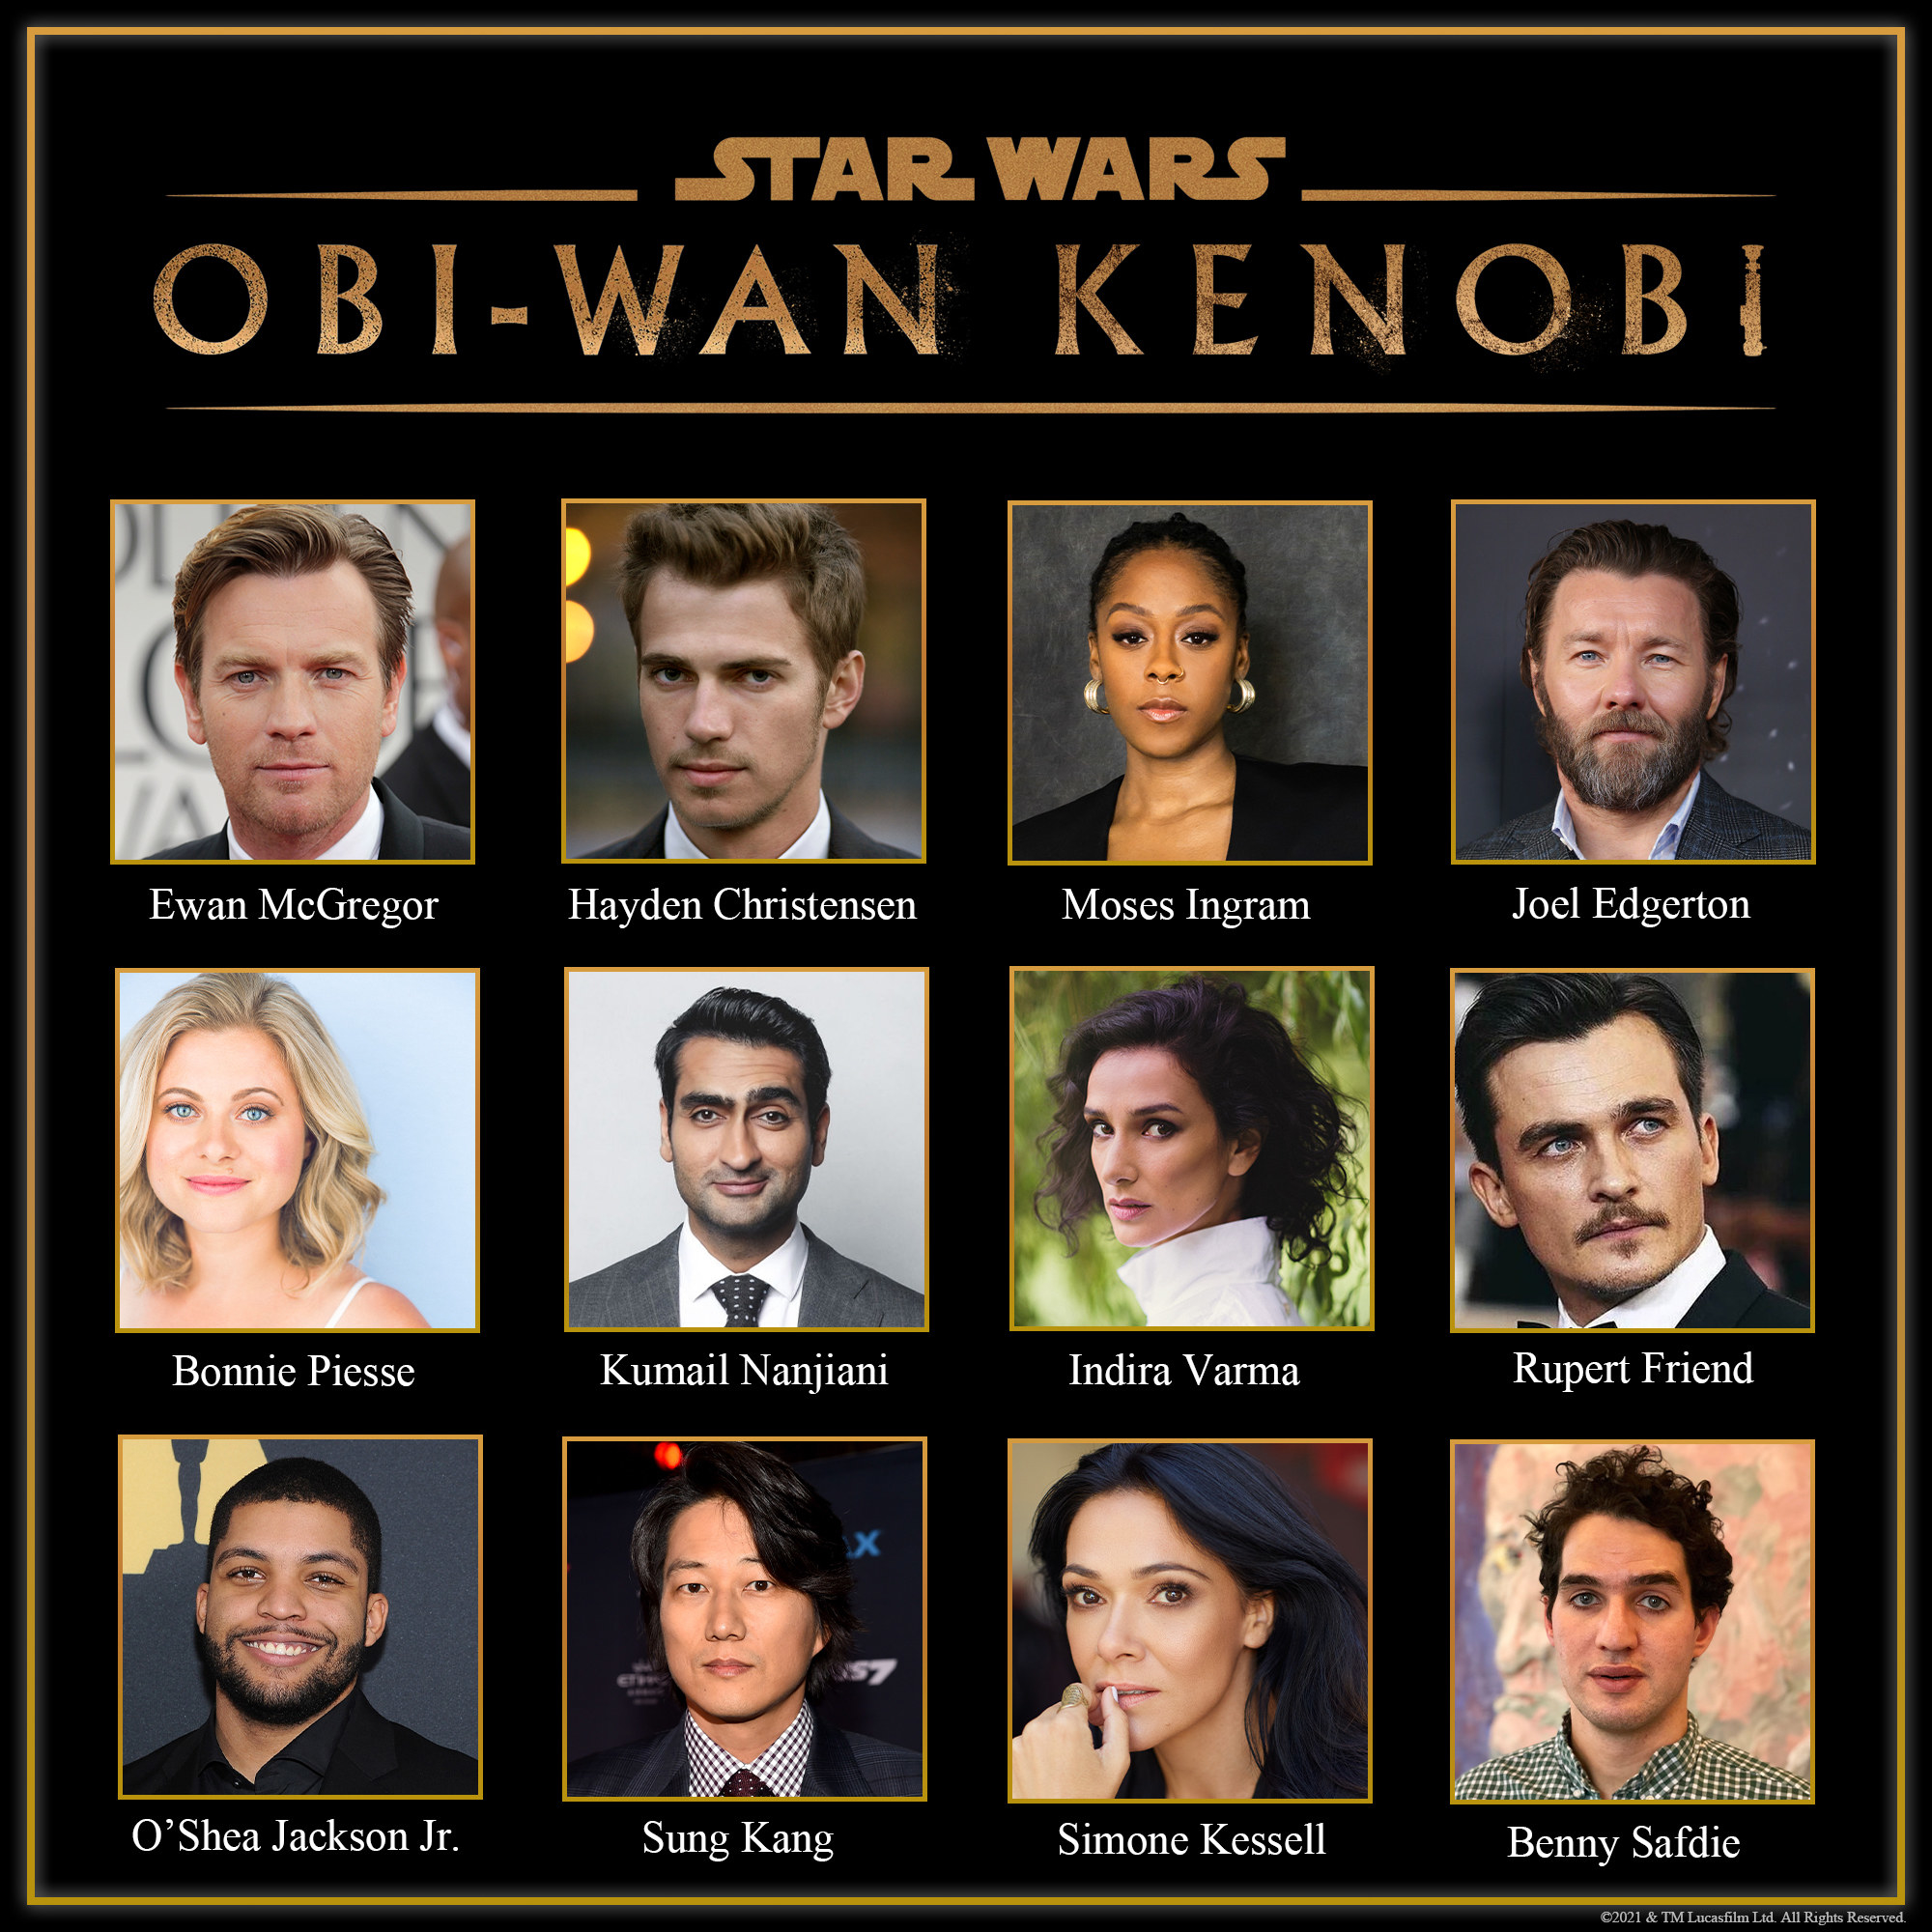 The cast list